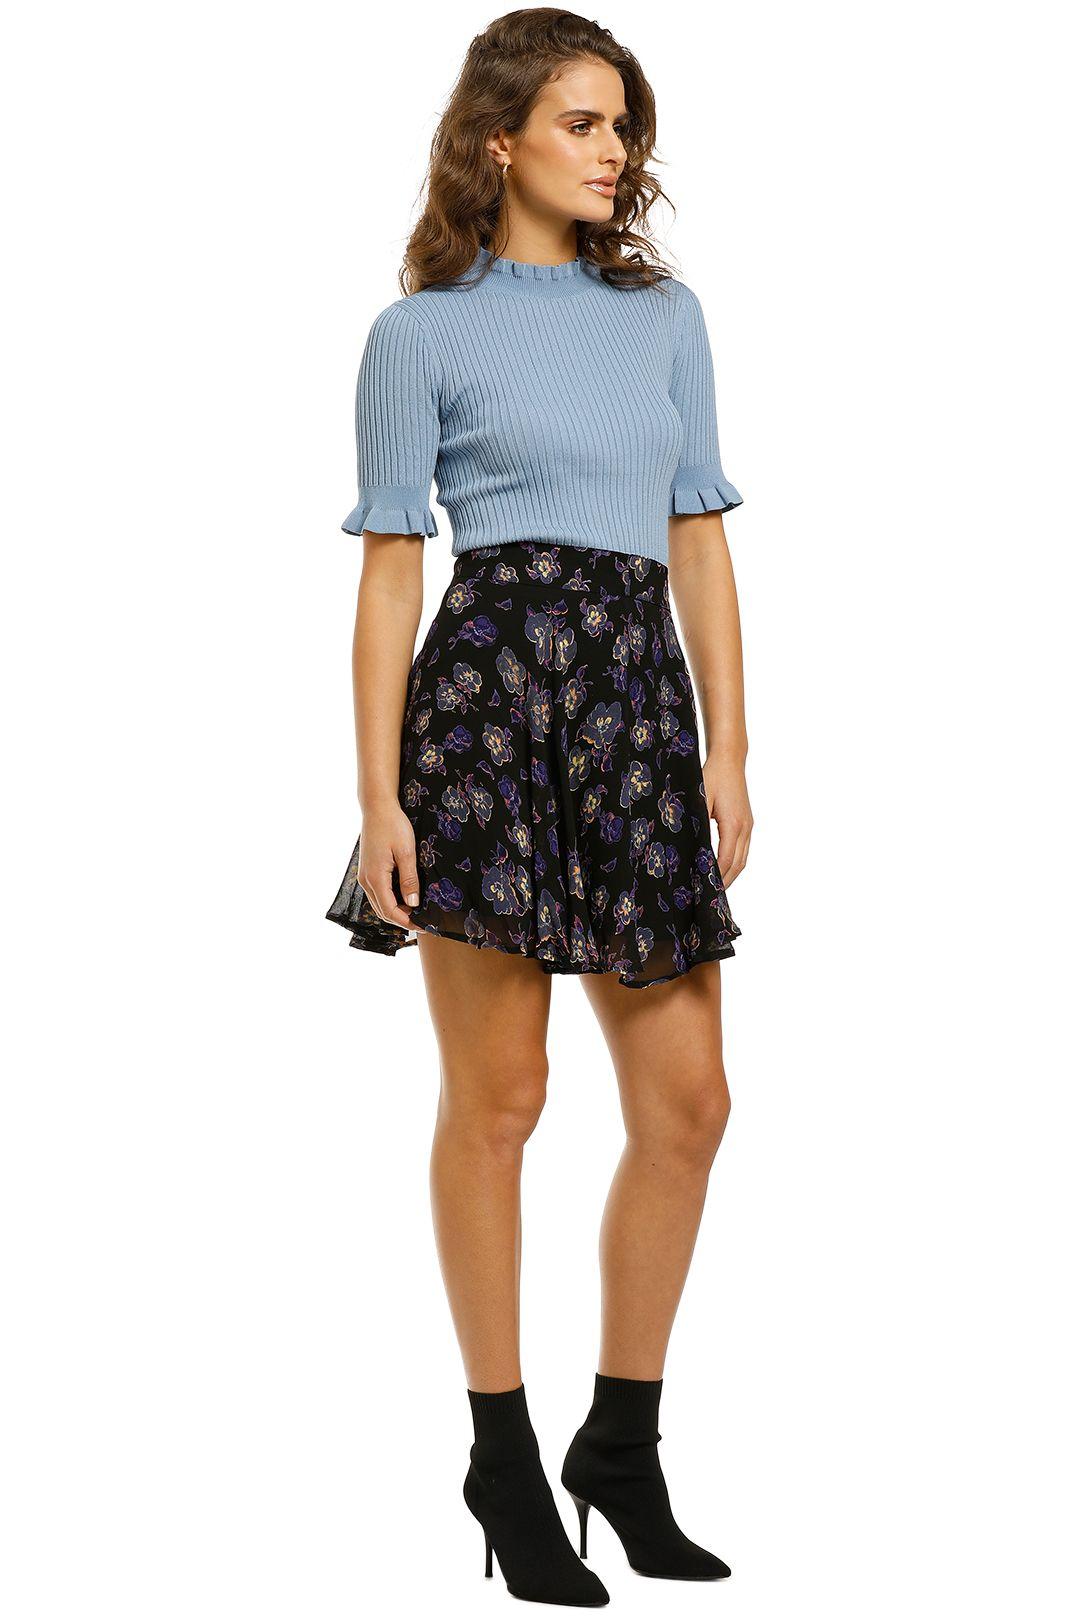 Ganni-Floral-Printed-Georgette-Skirt-Side